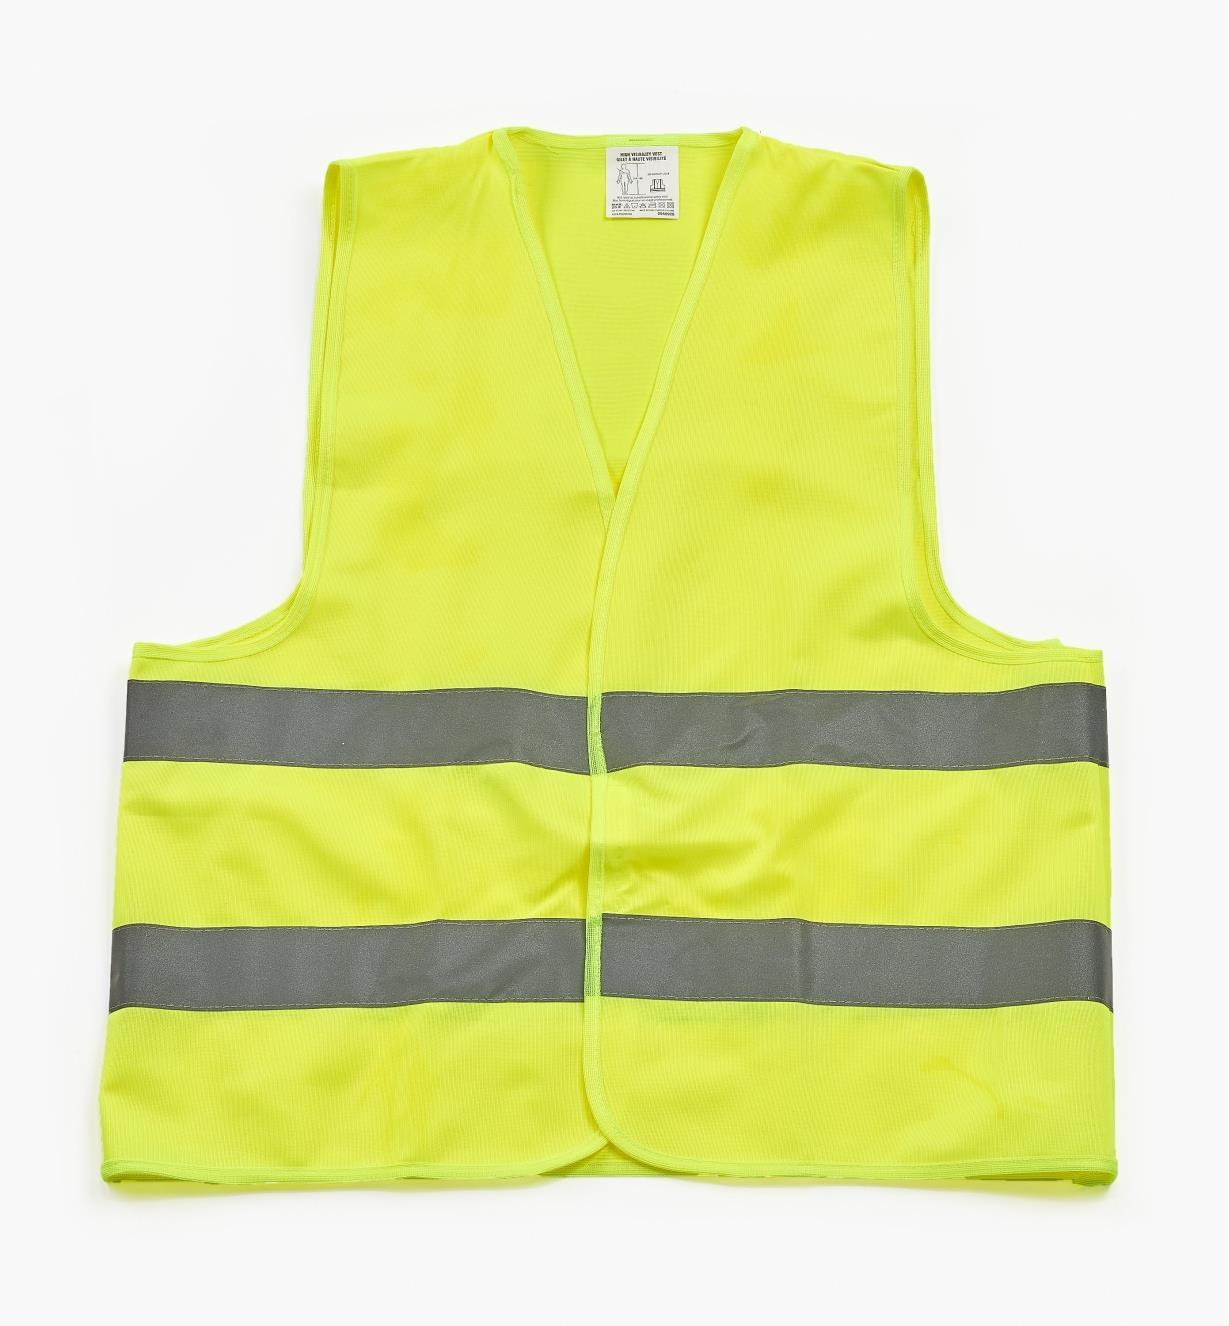 09A0925 - High-Visibility Vest, Medium